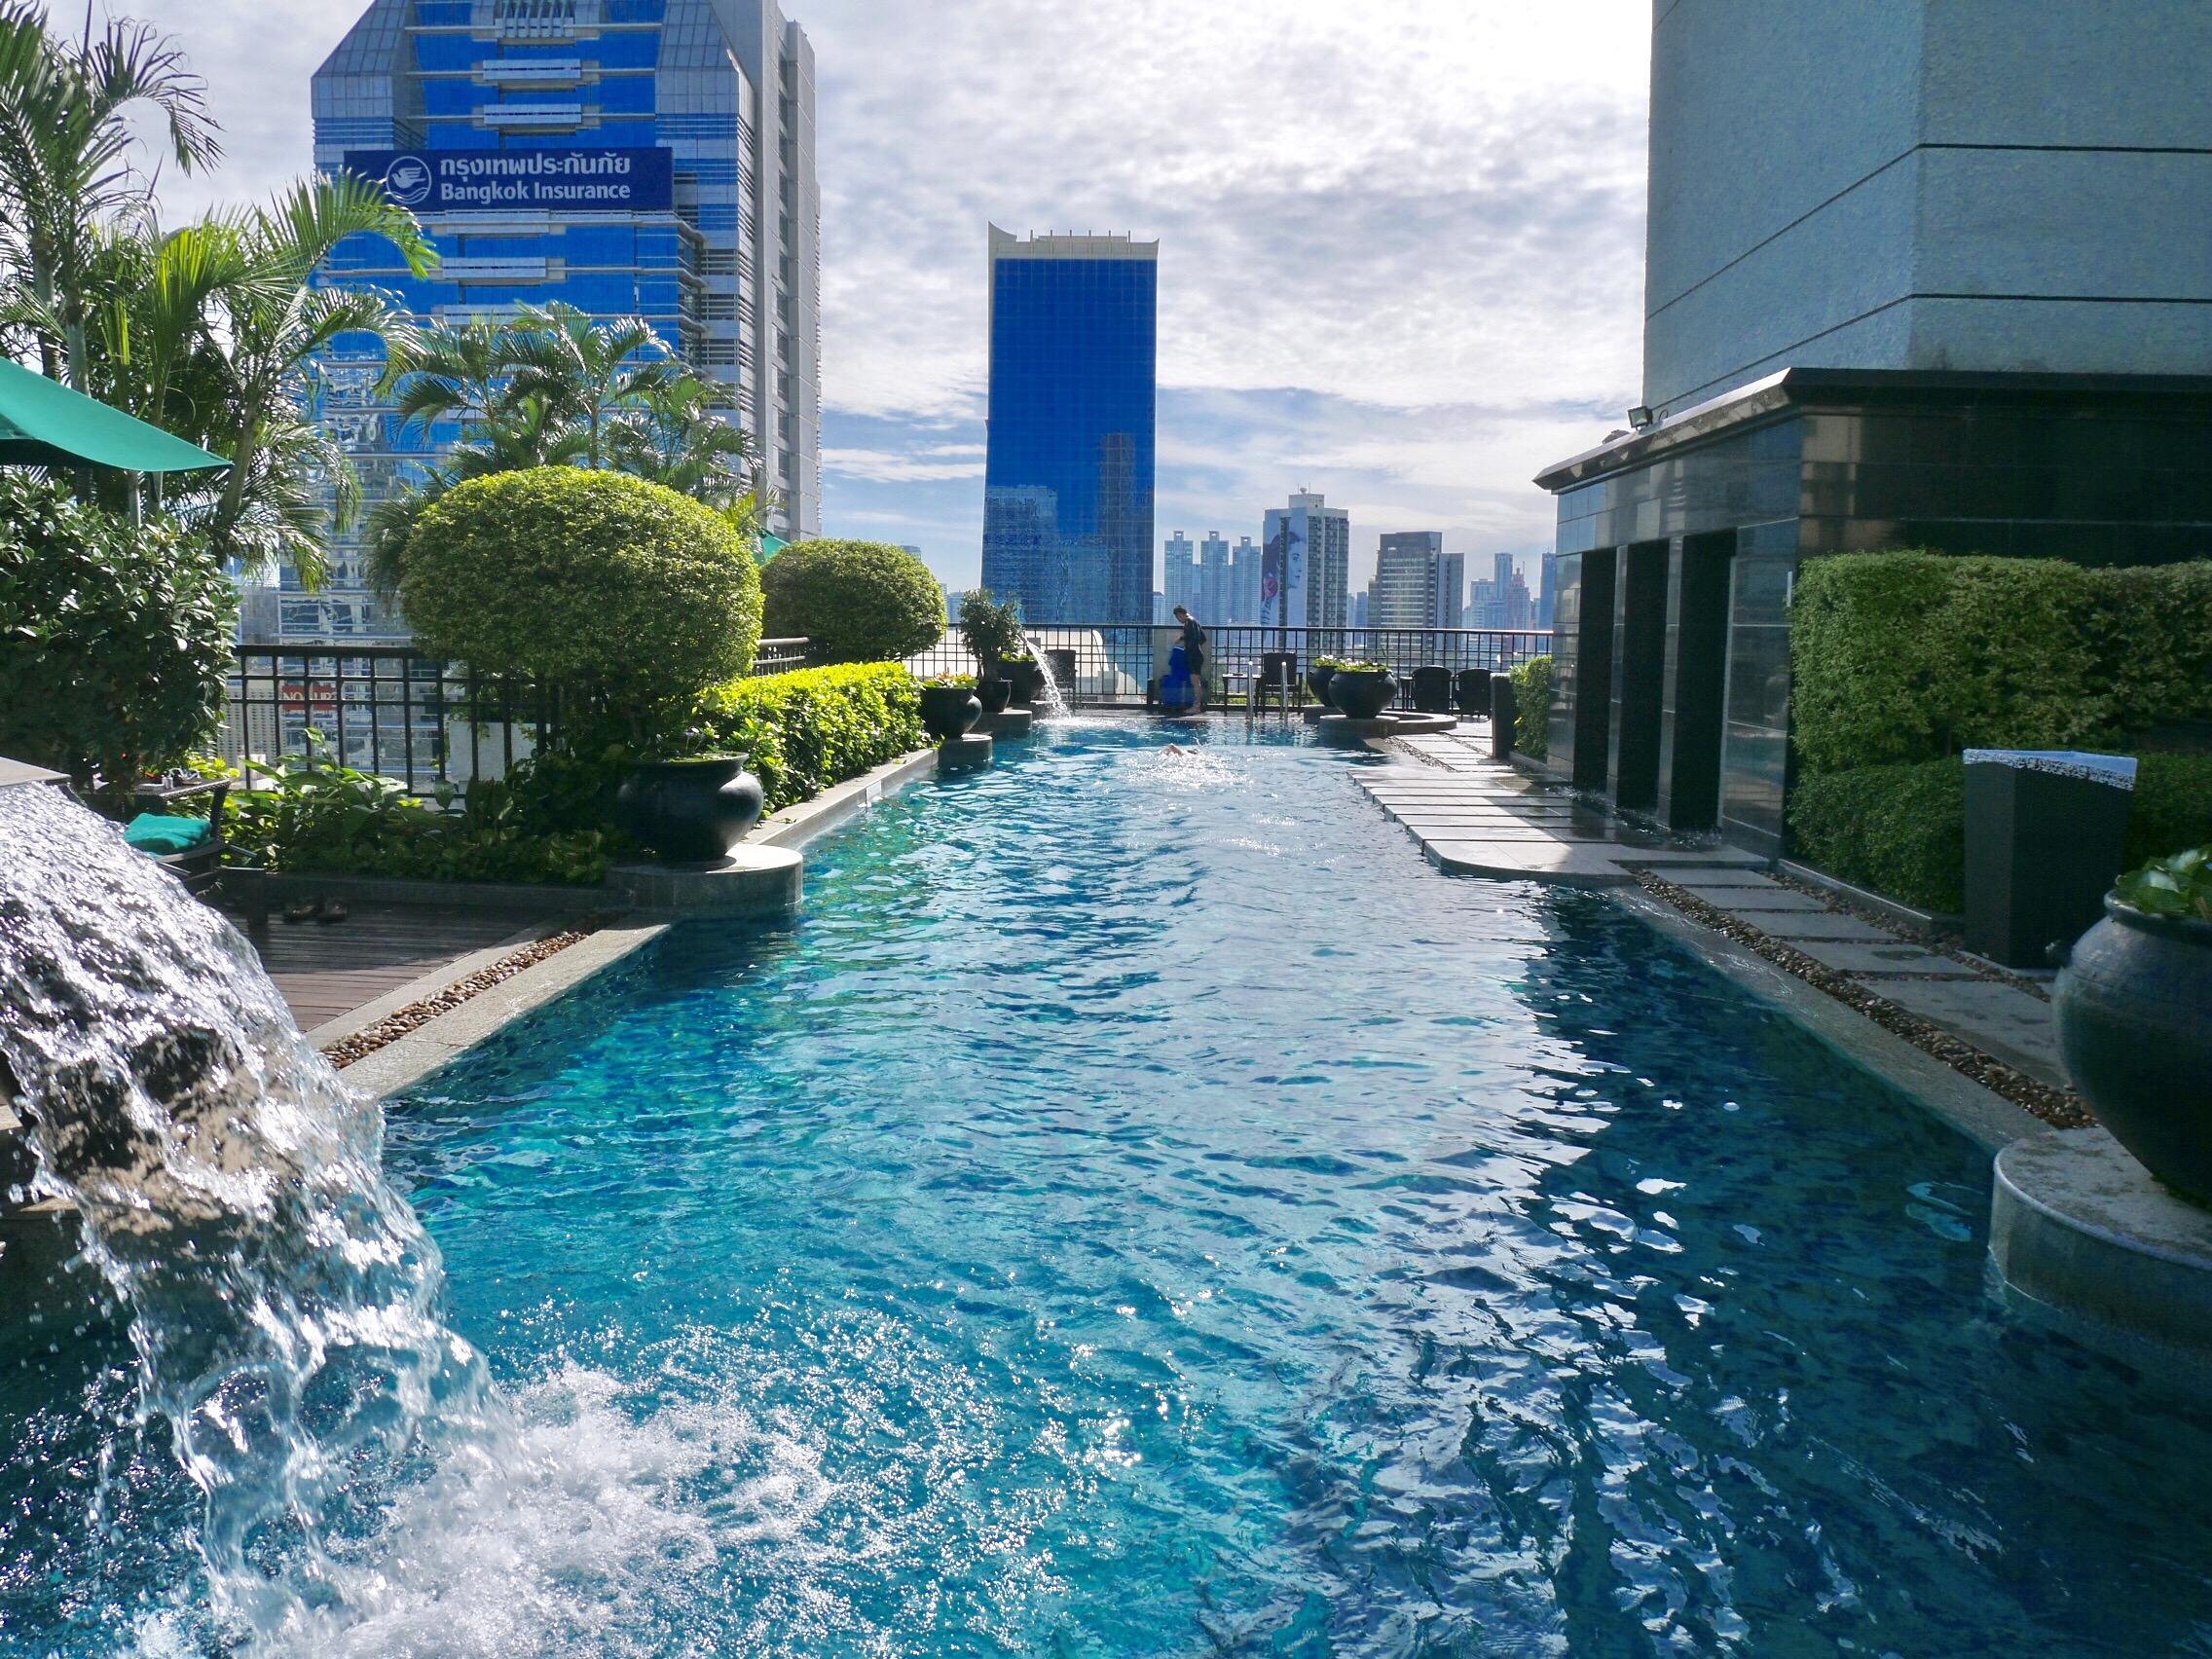 img 8521 - Banyan Tree Bangkok - 五つ星ホテルバンヤンツリーのSERENITY CLUBで過ごすリュクスな時間 「客室編」